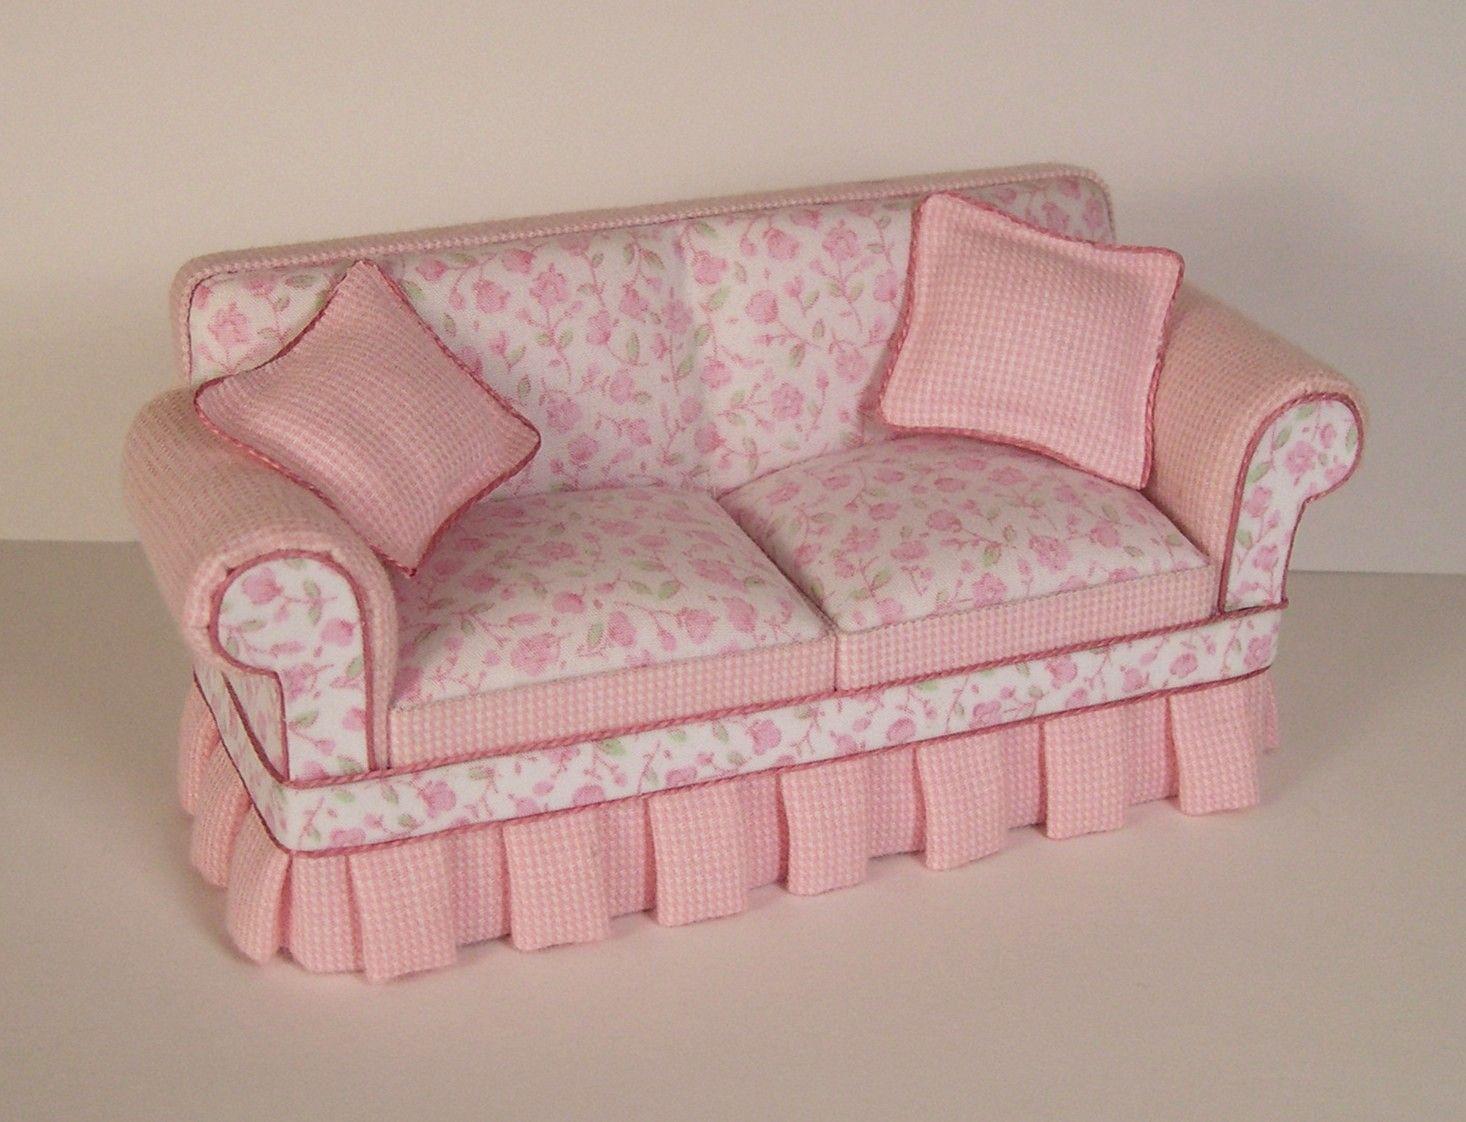 miniature sofa bob sofaly beaufort gazette vintage shabby chic furniture sc100